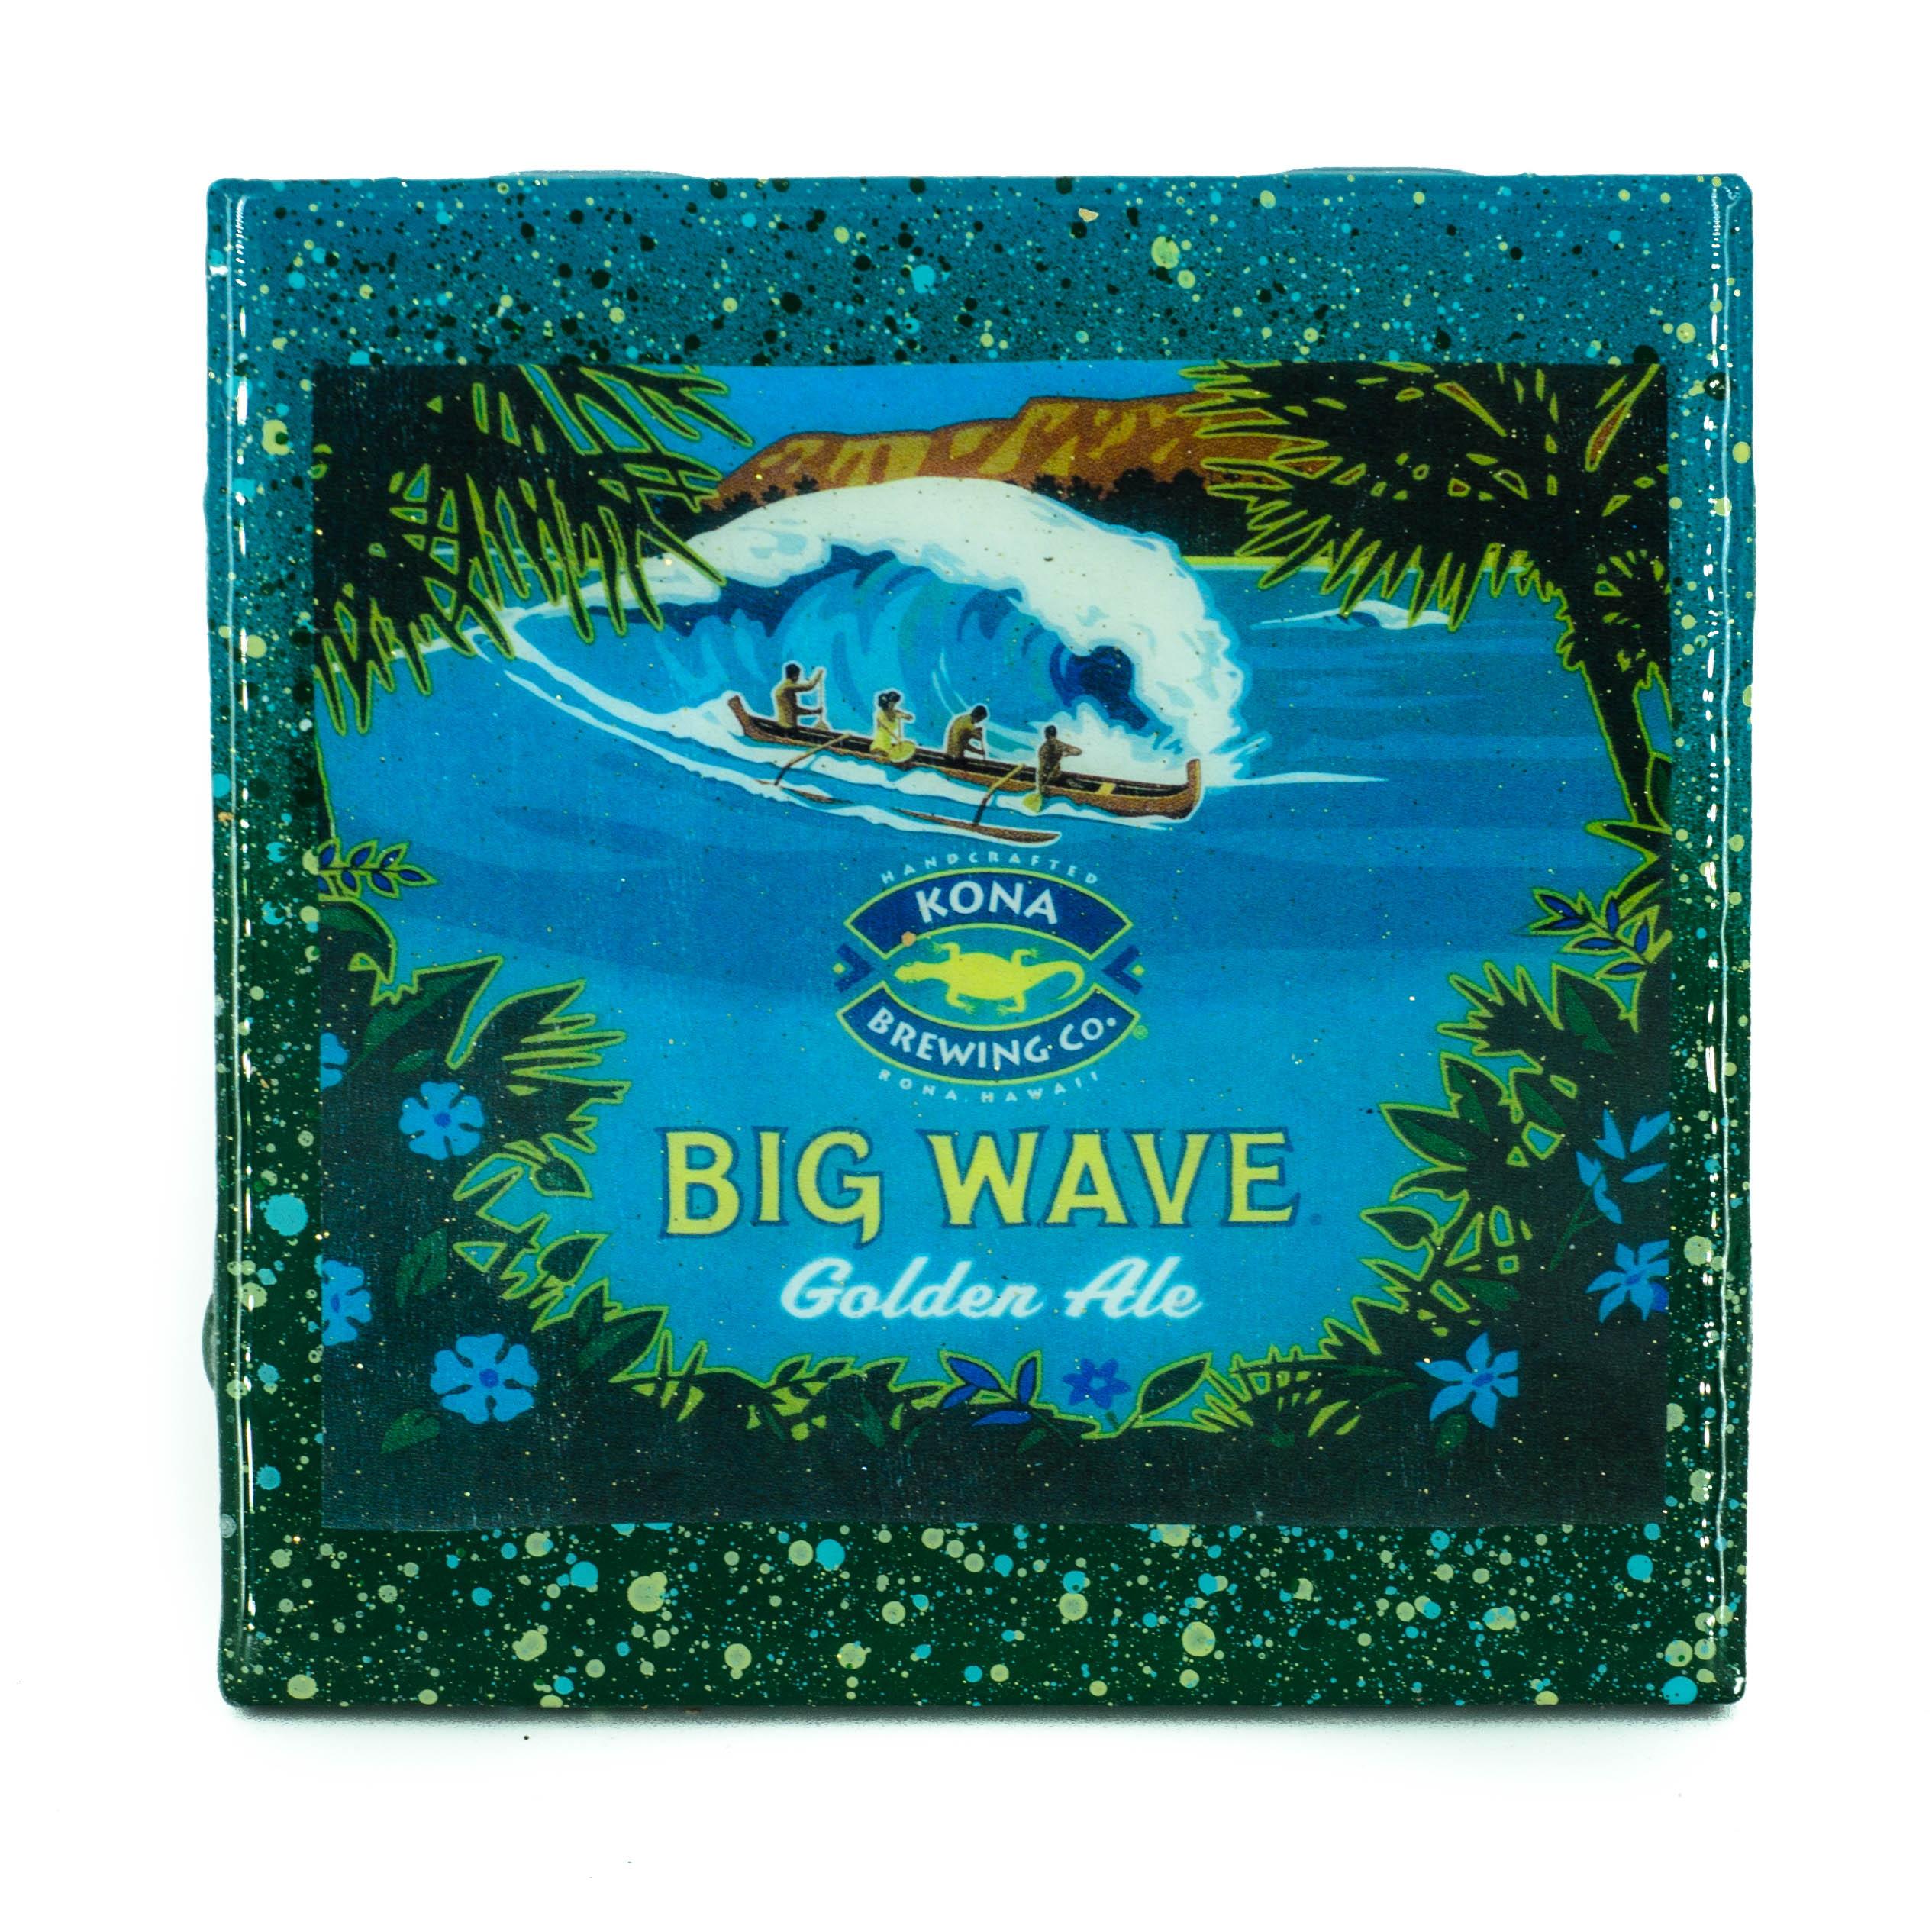 Stella Divina * | Handmade Coaster Kona - Big Wave craft beer label ...